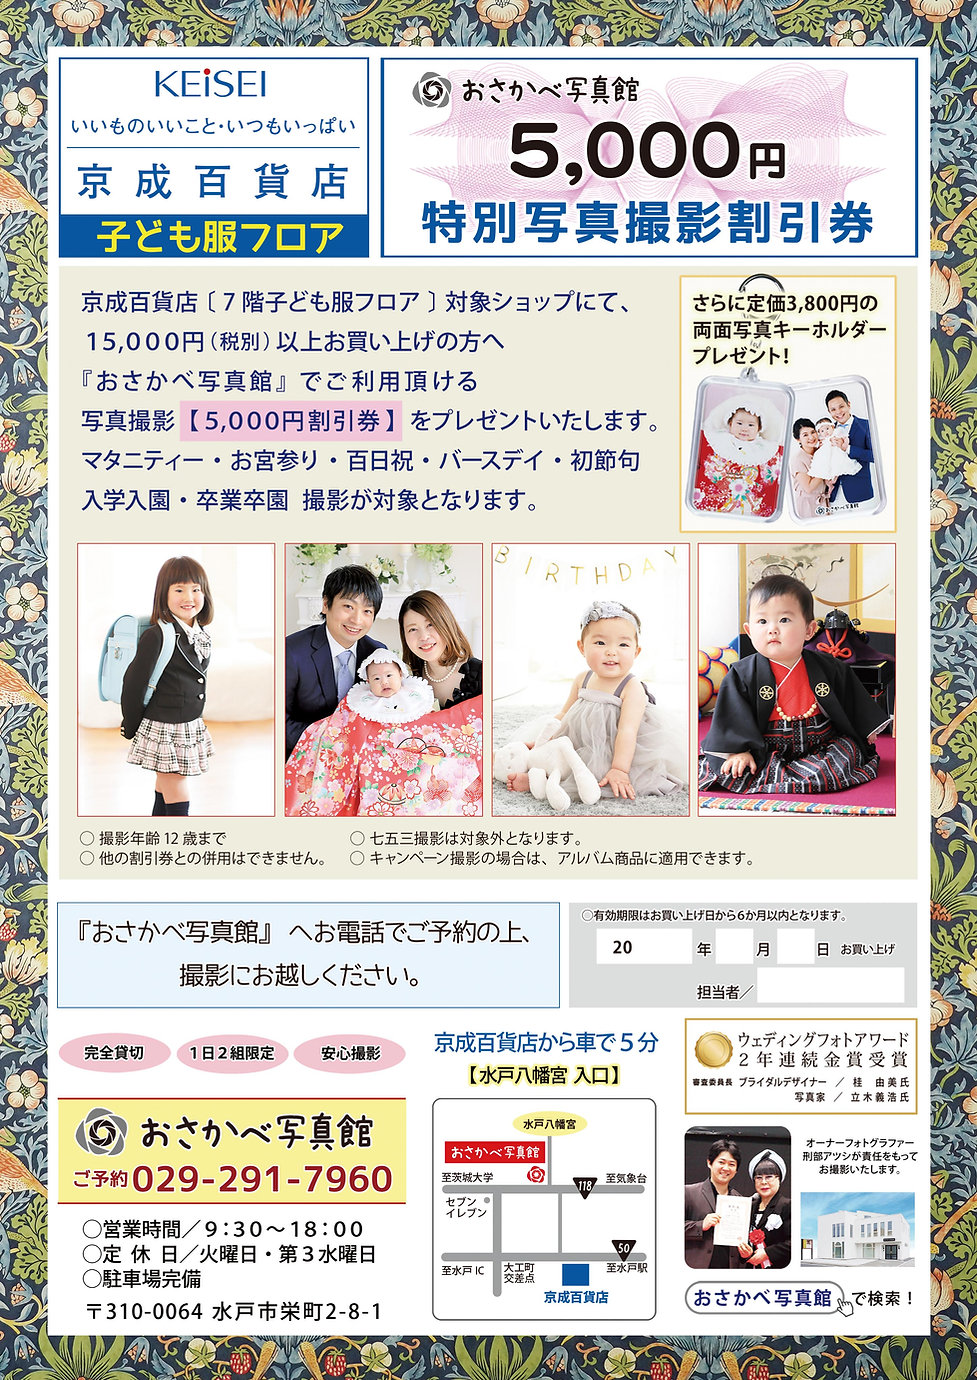 keisei_5000.jpg